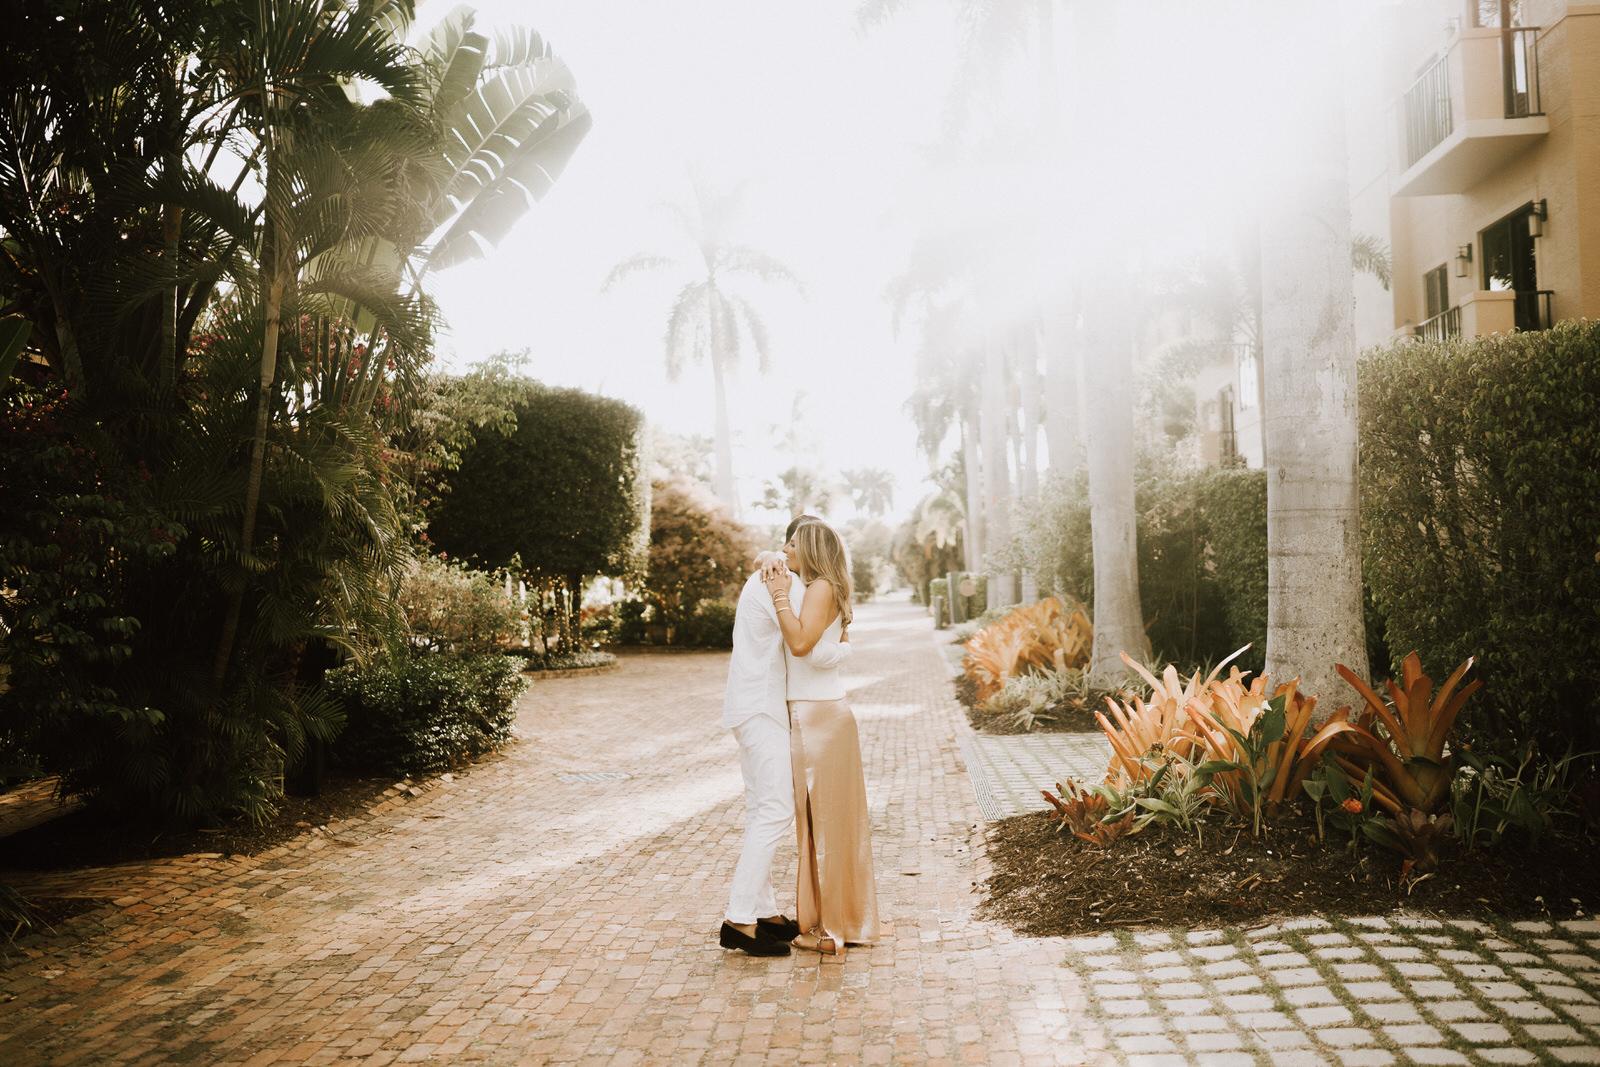 Naples 5th Ave Engagement Photos- Michelle Gonzalez Photography- Michele + Troy-33.JPG